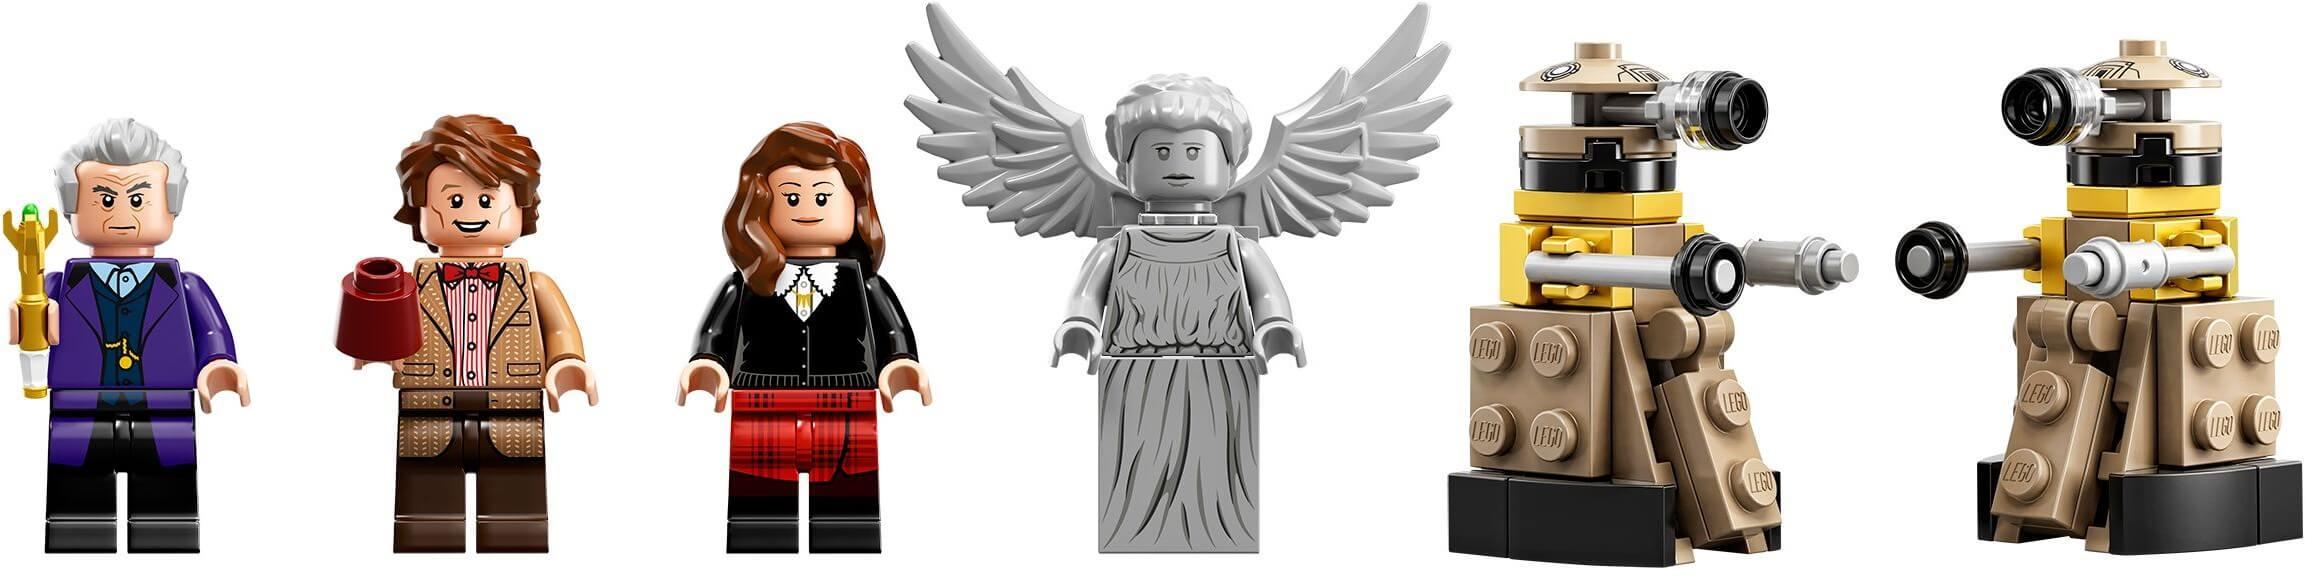 Mua đồ chơi LEGO 21304 - LEGO Ideas 21304 - Căn Phòng Thời Gian của Doctor Who (LEGO Ideas Doctor Who 21304)